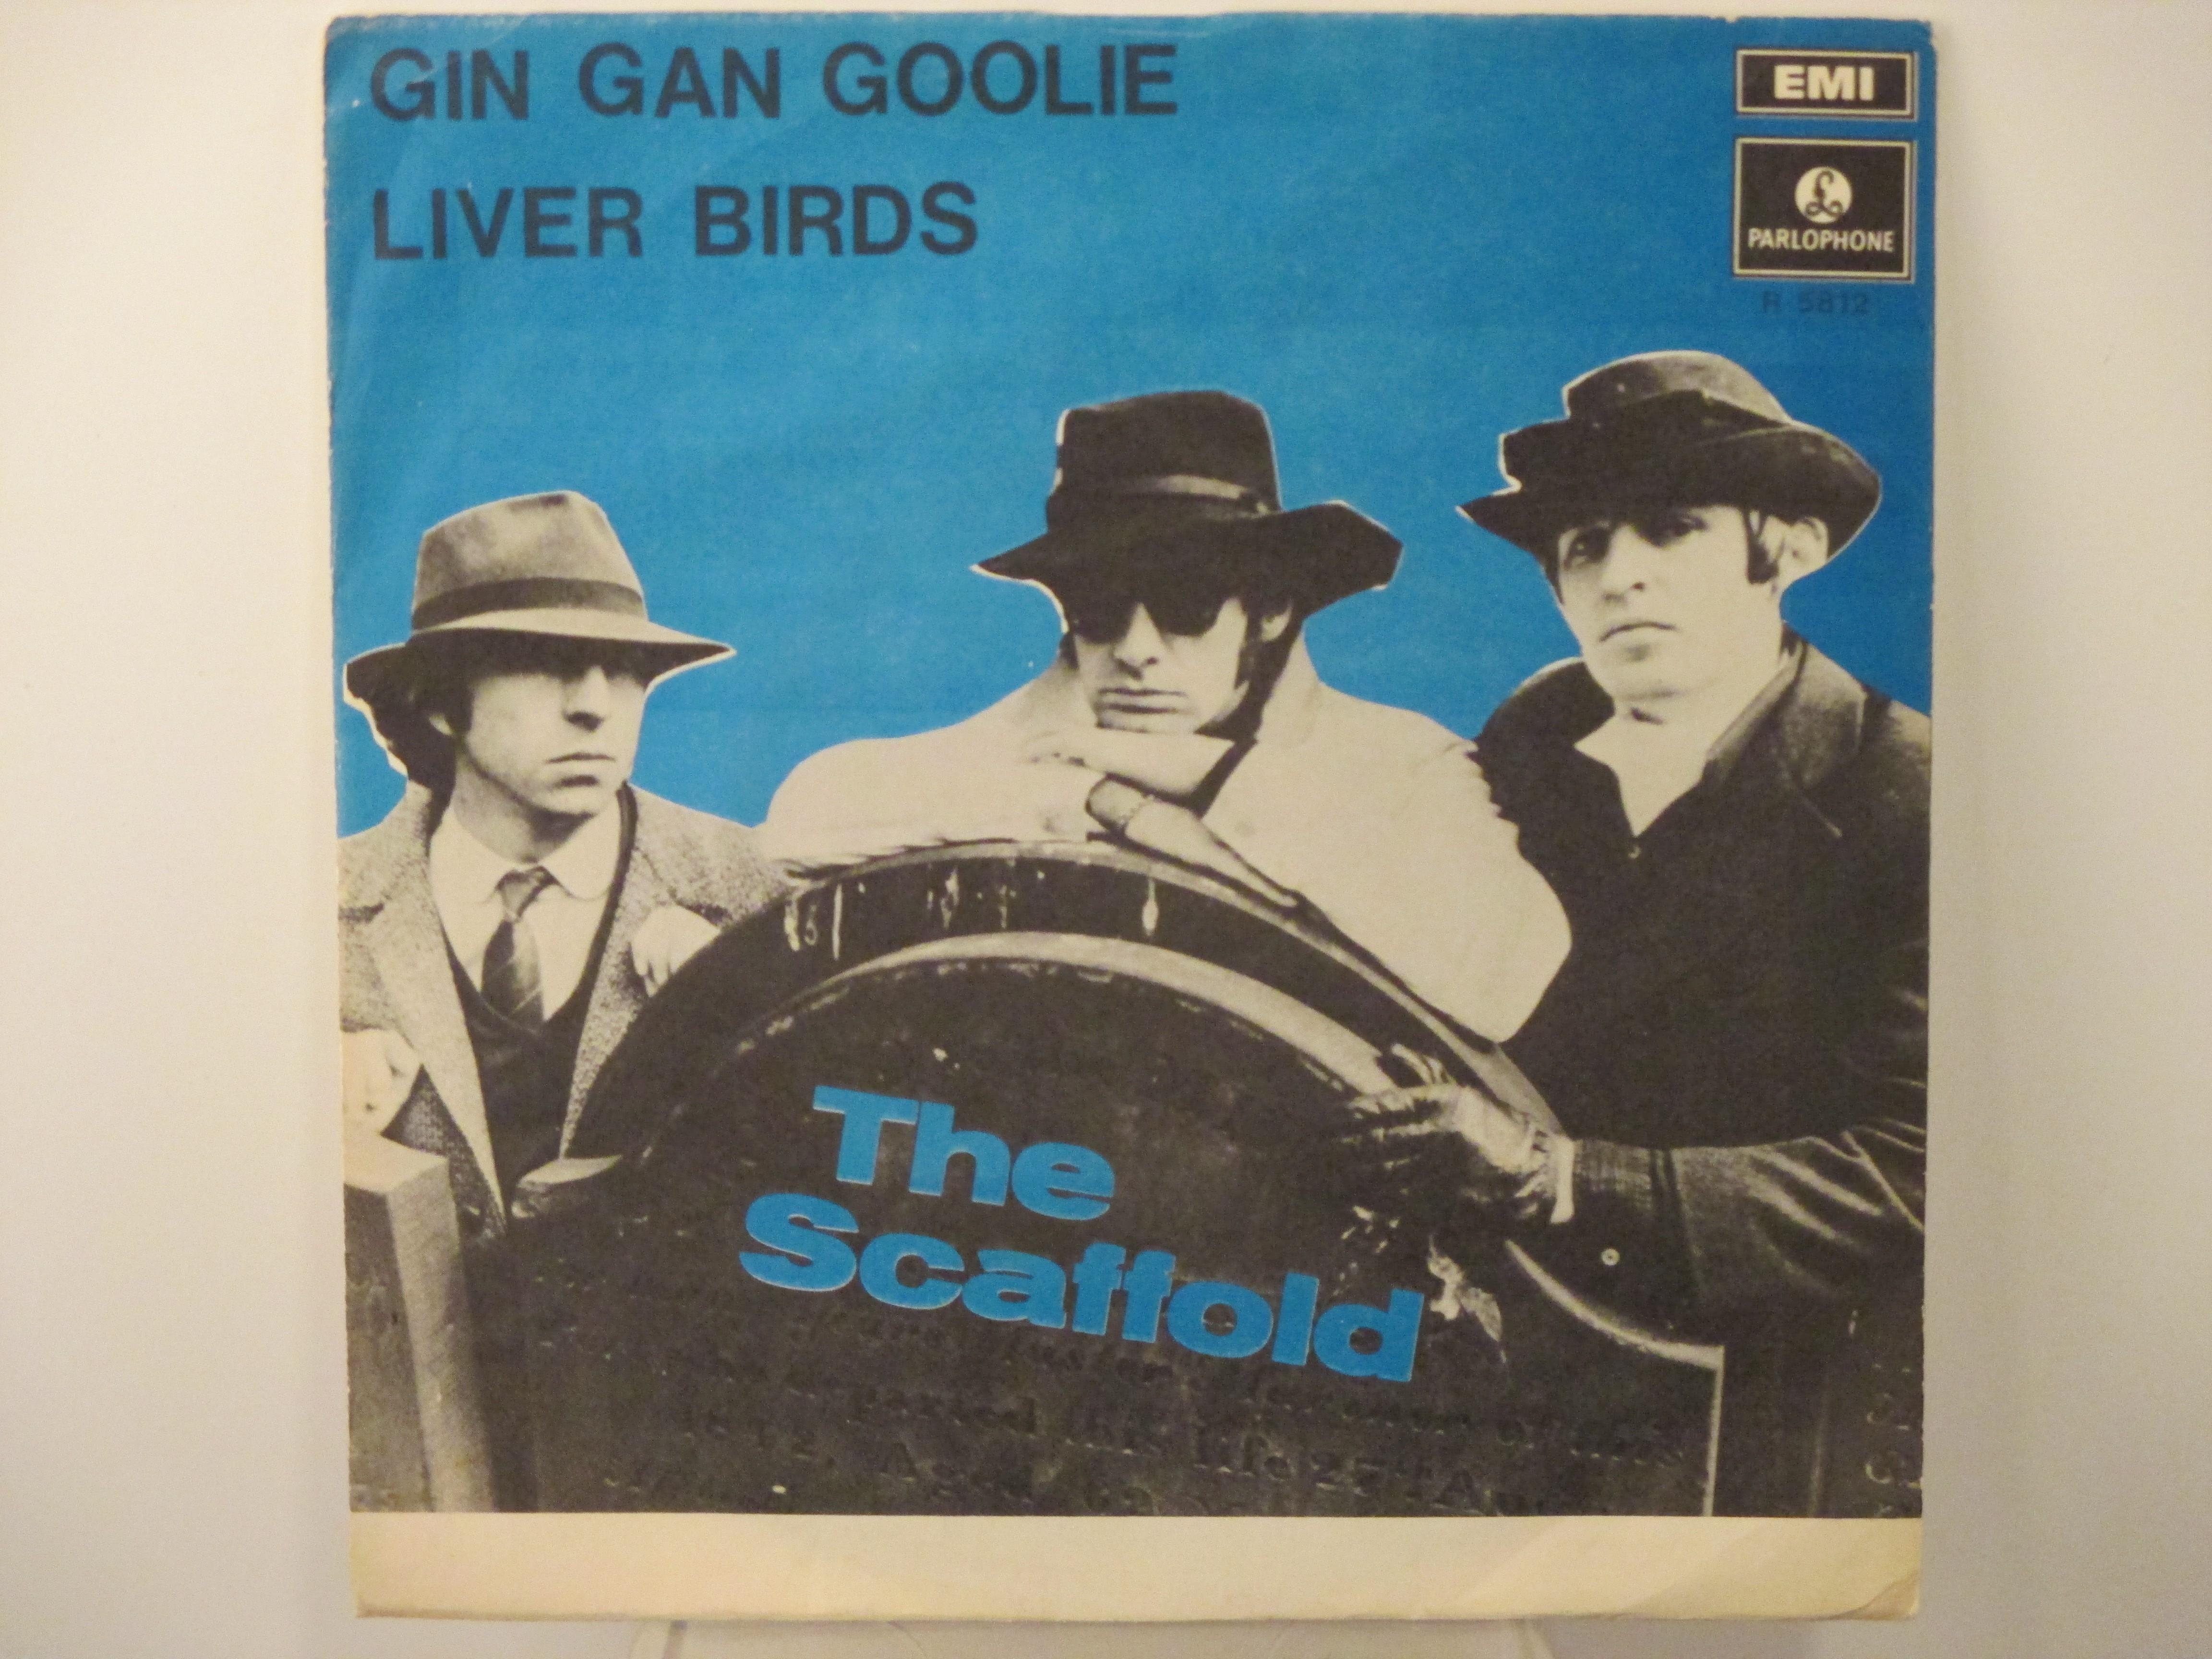 SCAFFOLD : Gin gin goolie / Liver birds